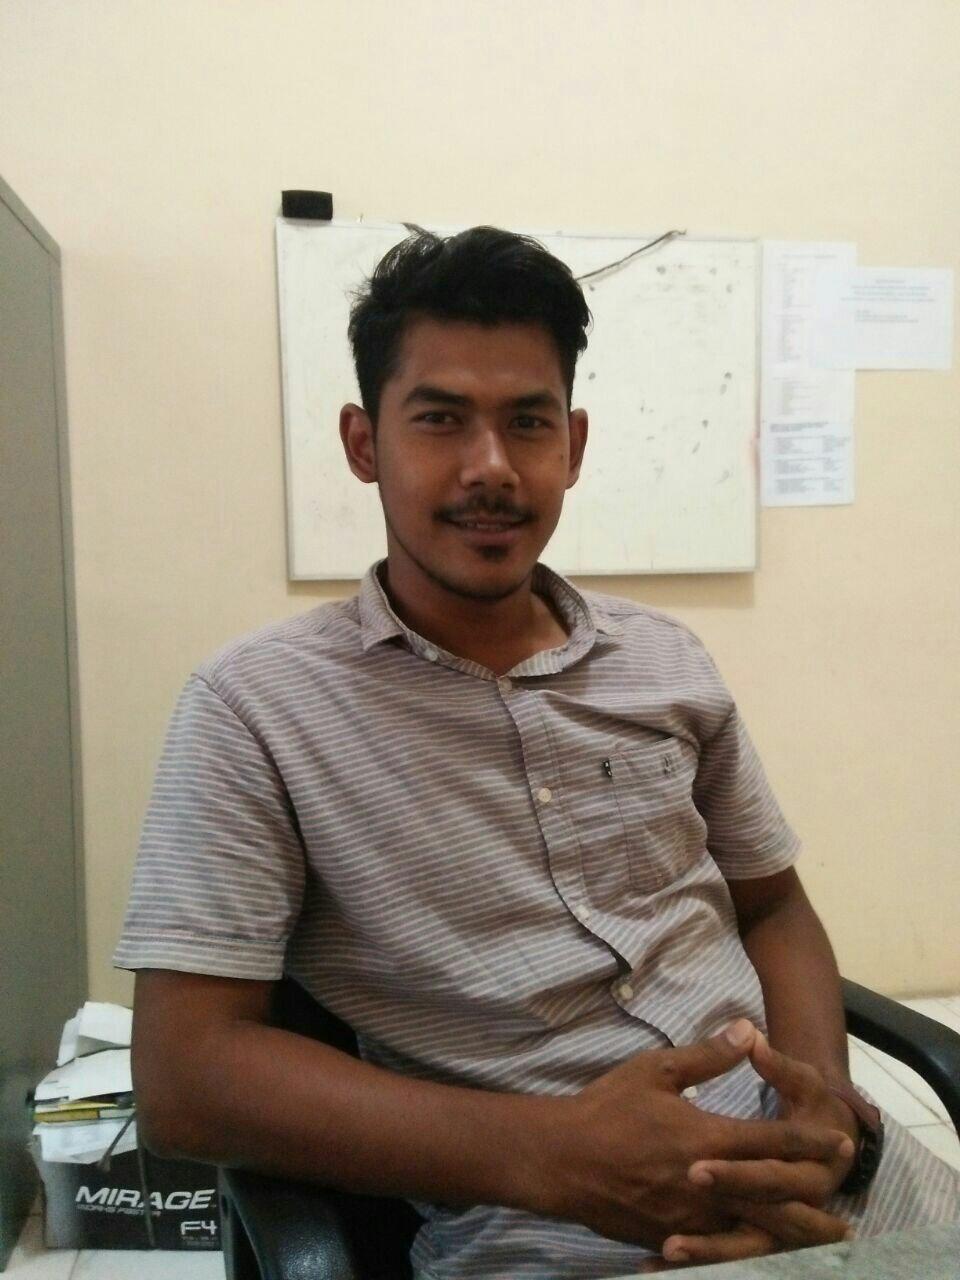 Dedek Ardiansyah tokoh muda dari Gampong Buket Pulo, Kecamatan Langsa Timur Kota Langsa, Rabu,(30/08/17) Foto :Syeh.